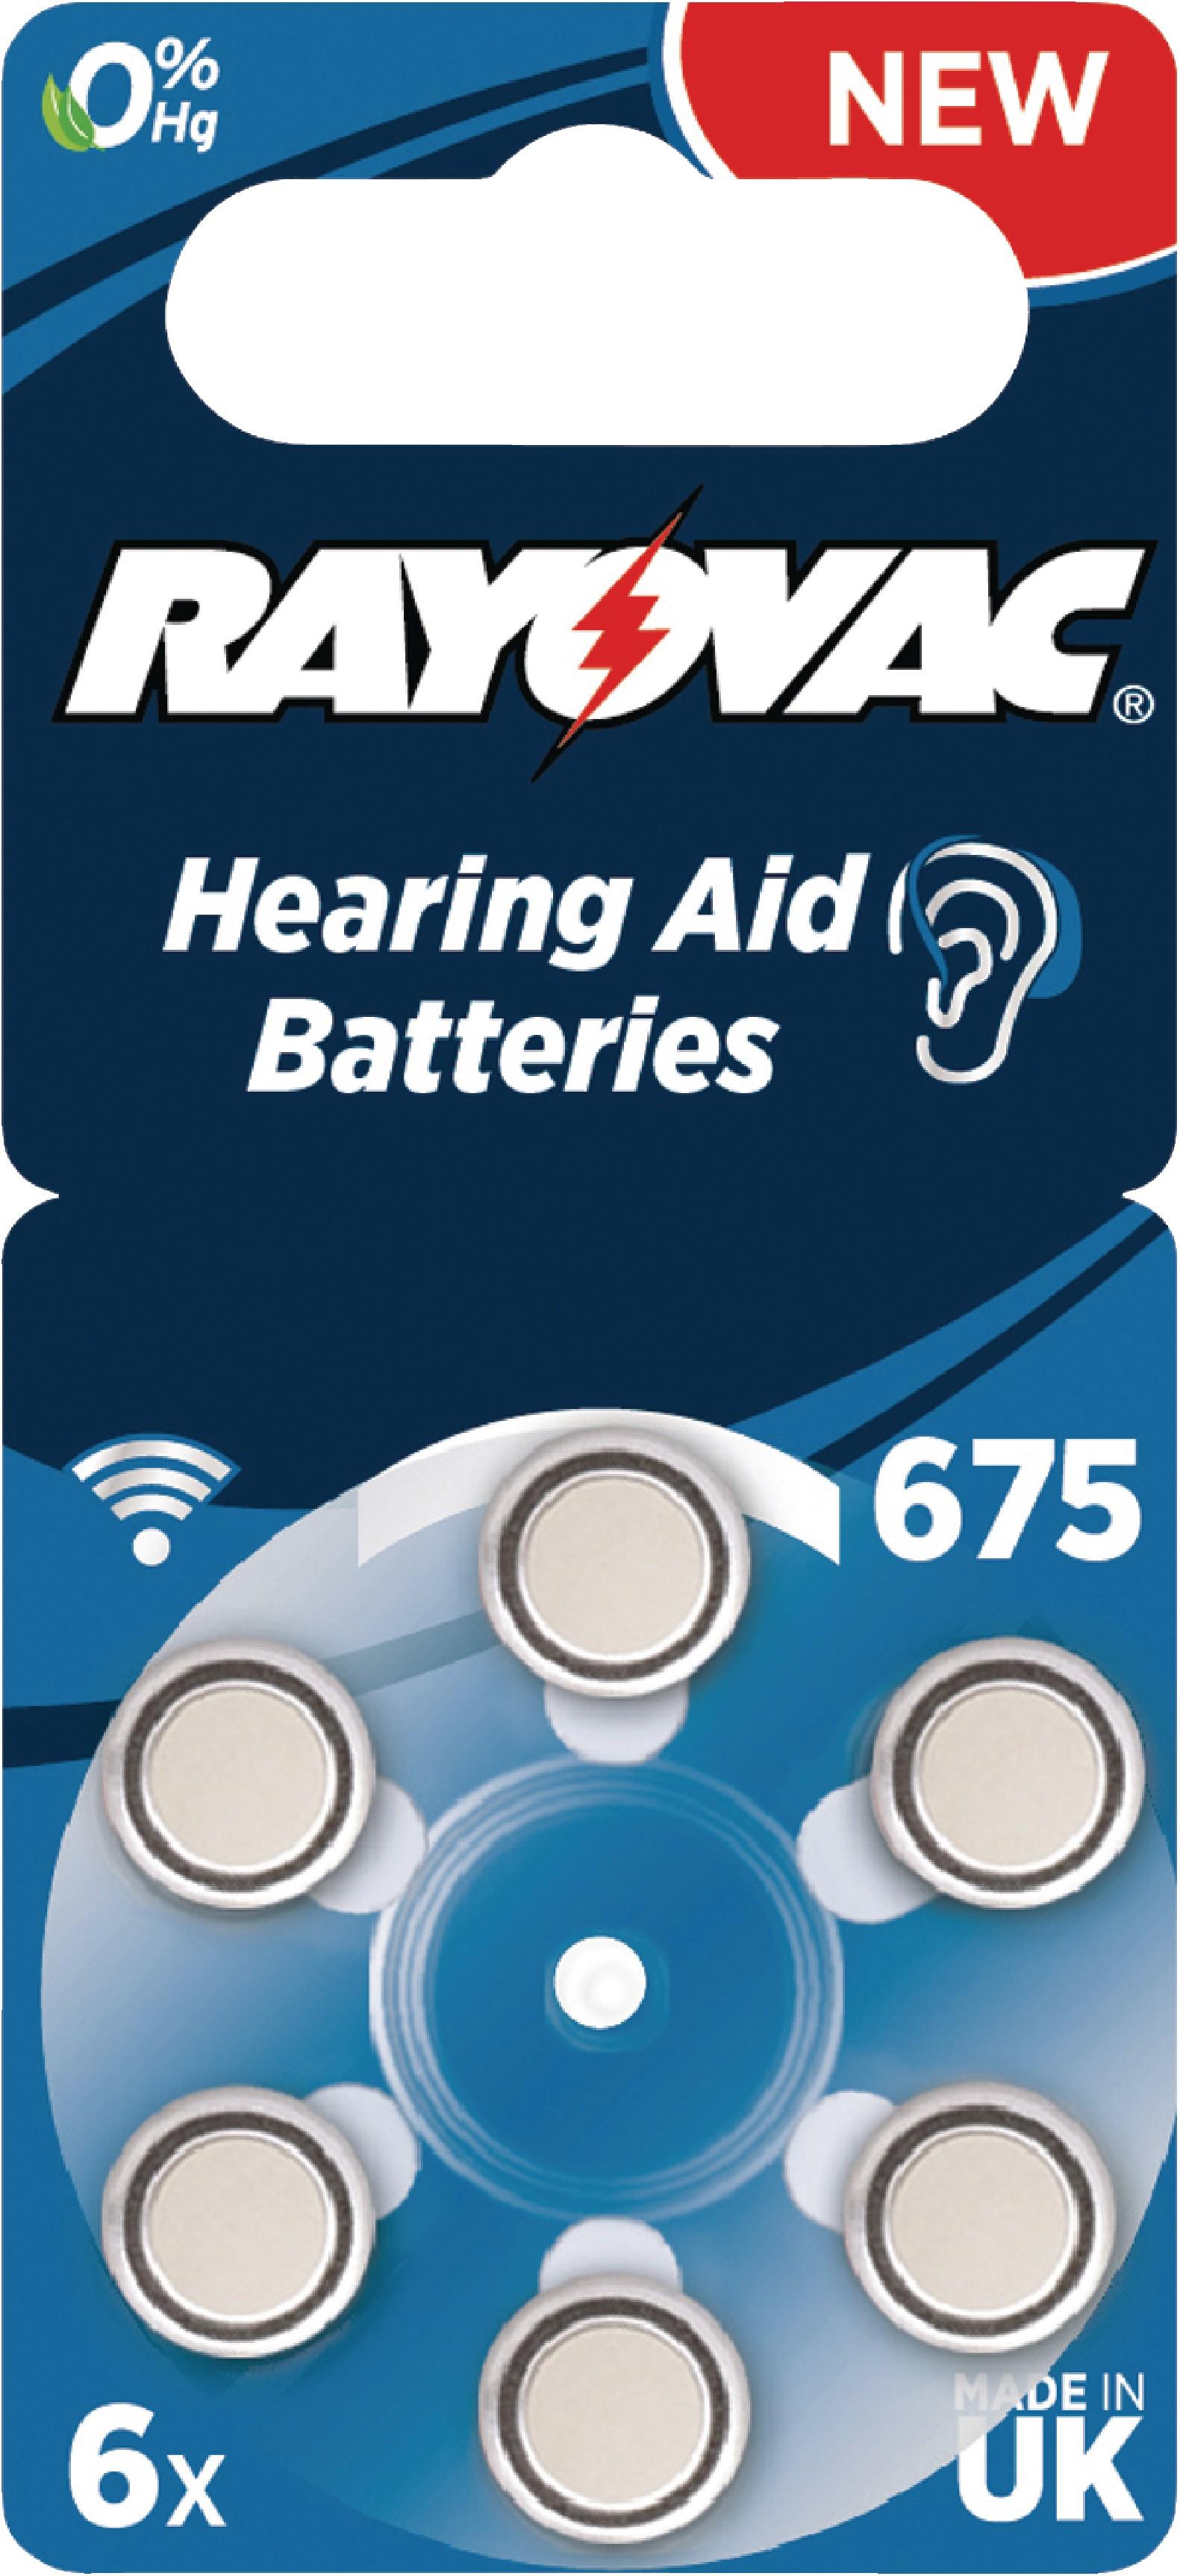 Zinkovzduchová Baterie PR44 1.4 V 6-Blistr